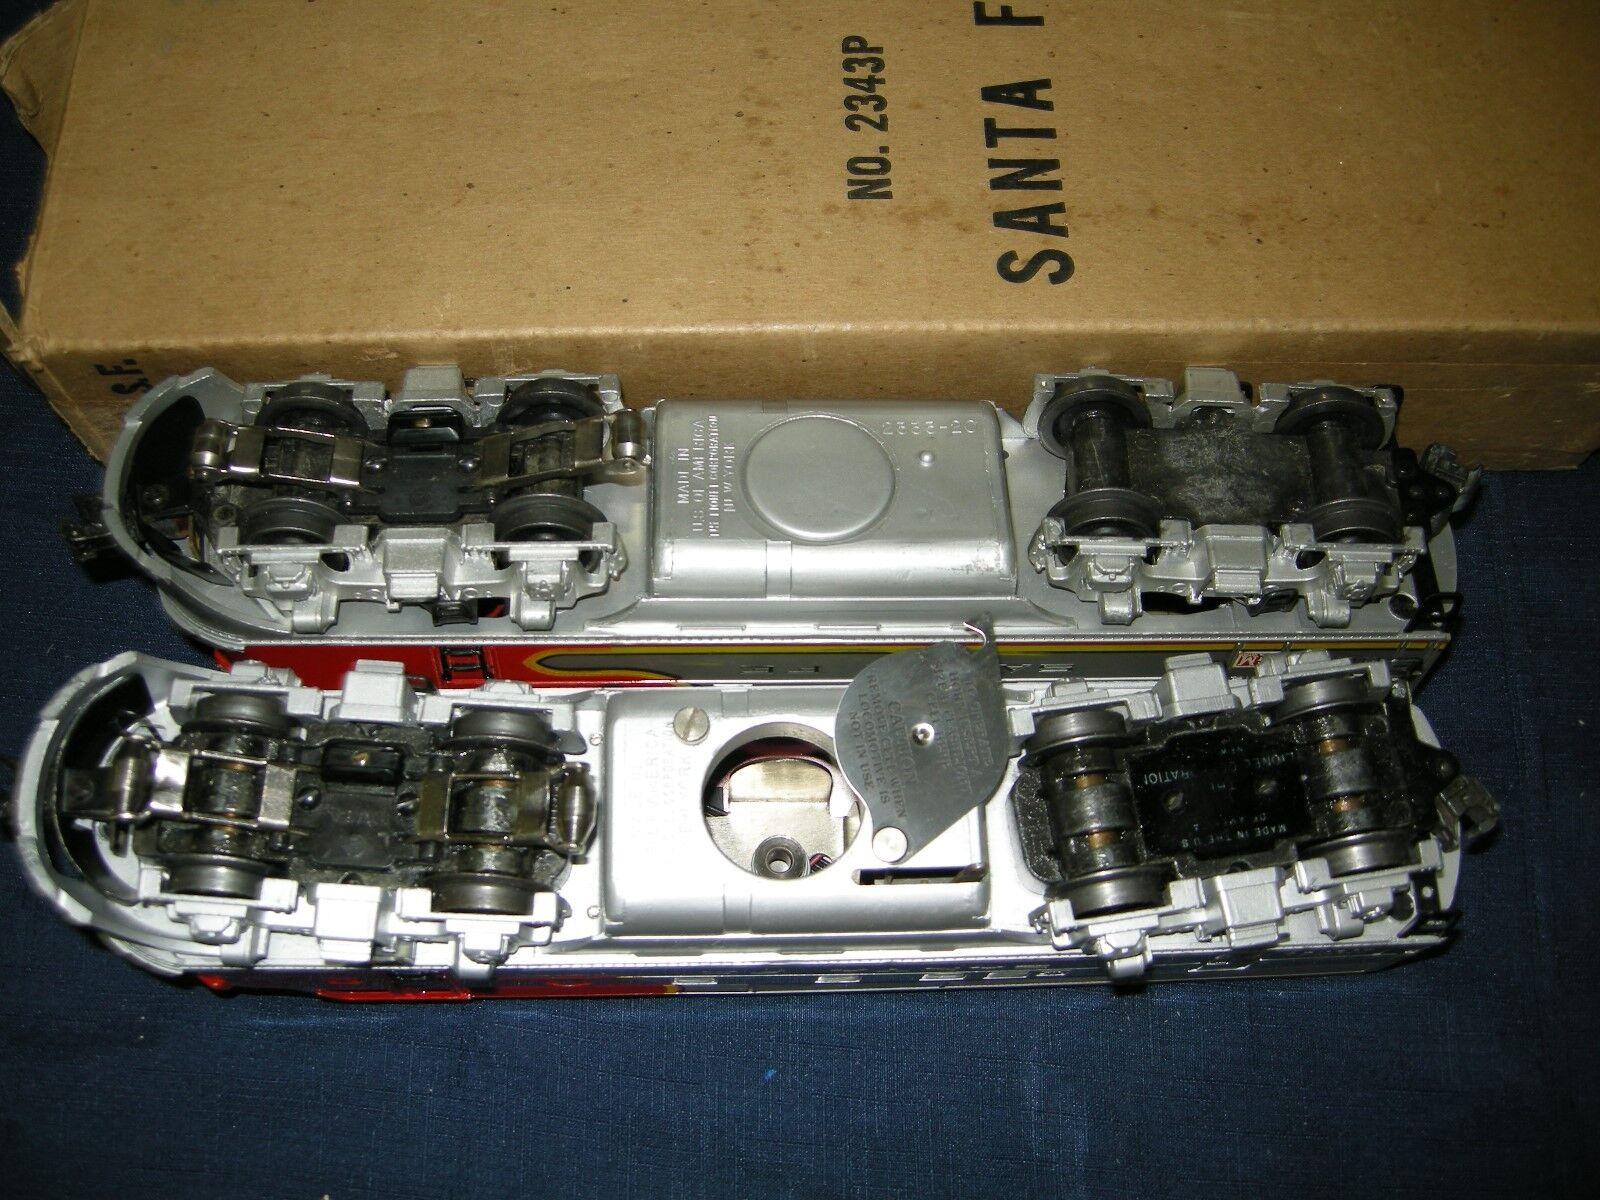 LIONEL 2343 SANTA FE F3 F3 F3 AA E+ C7+ IN OB'S W SCARCE YELLOW MOLDED PLASTIC CABS de4c8f